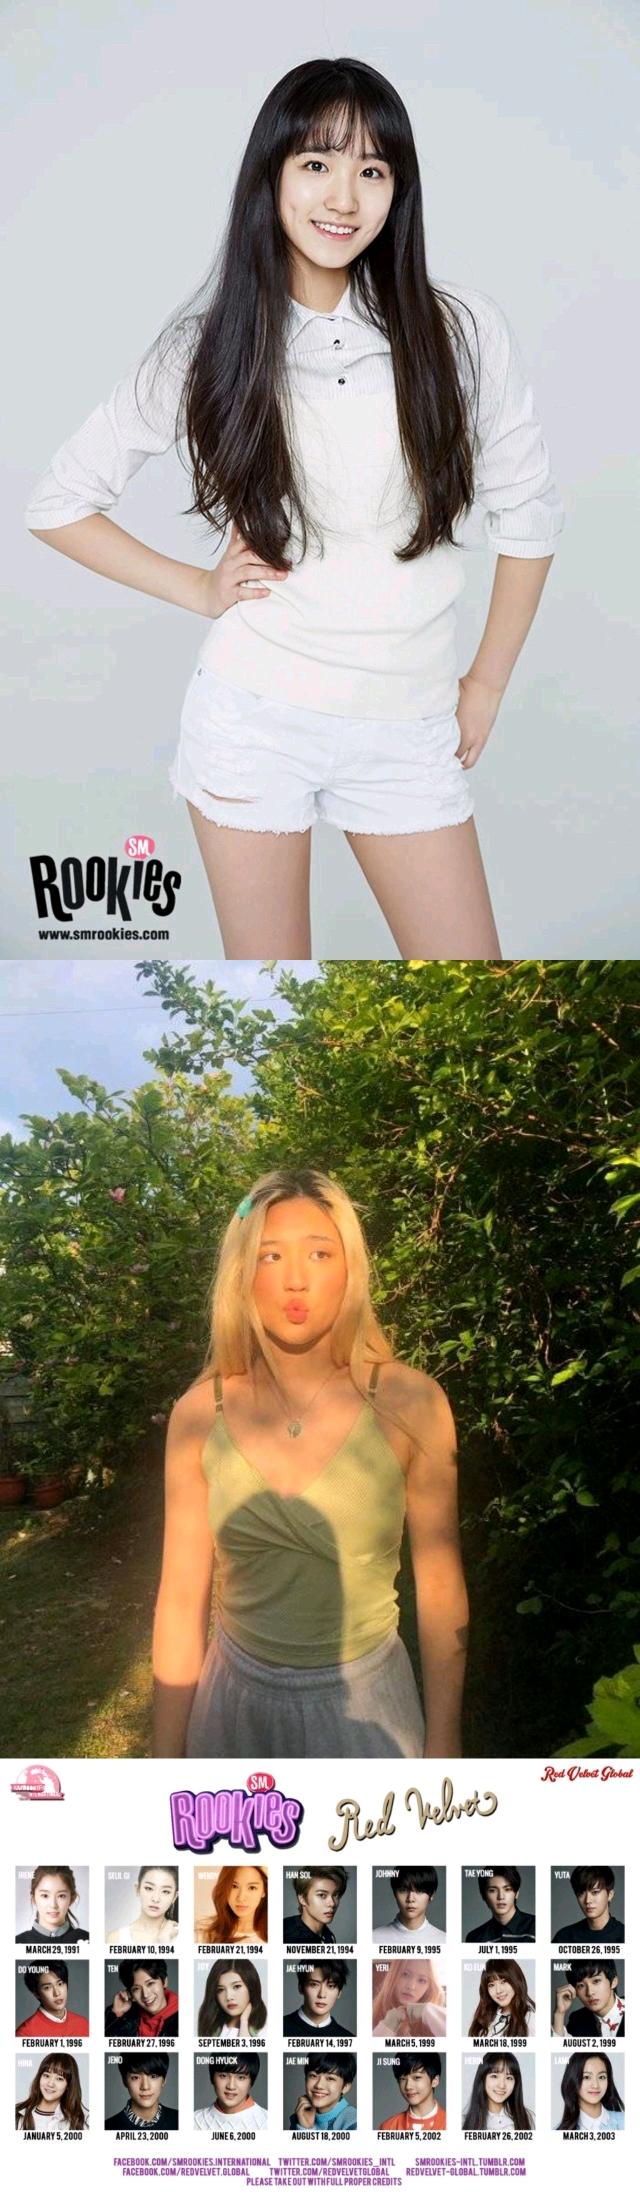 Yeri和SM前练习生Herin见面,大部分韩国网友却都在指责不戴口罩